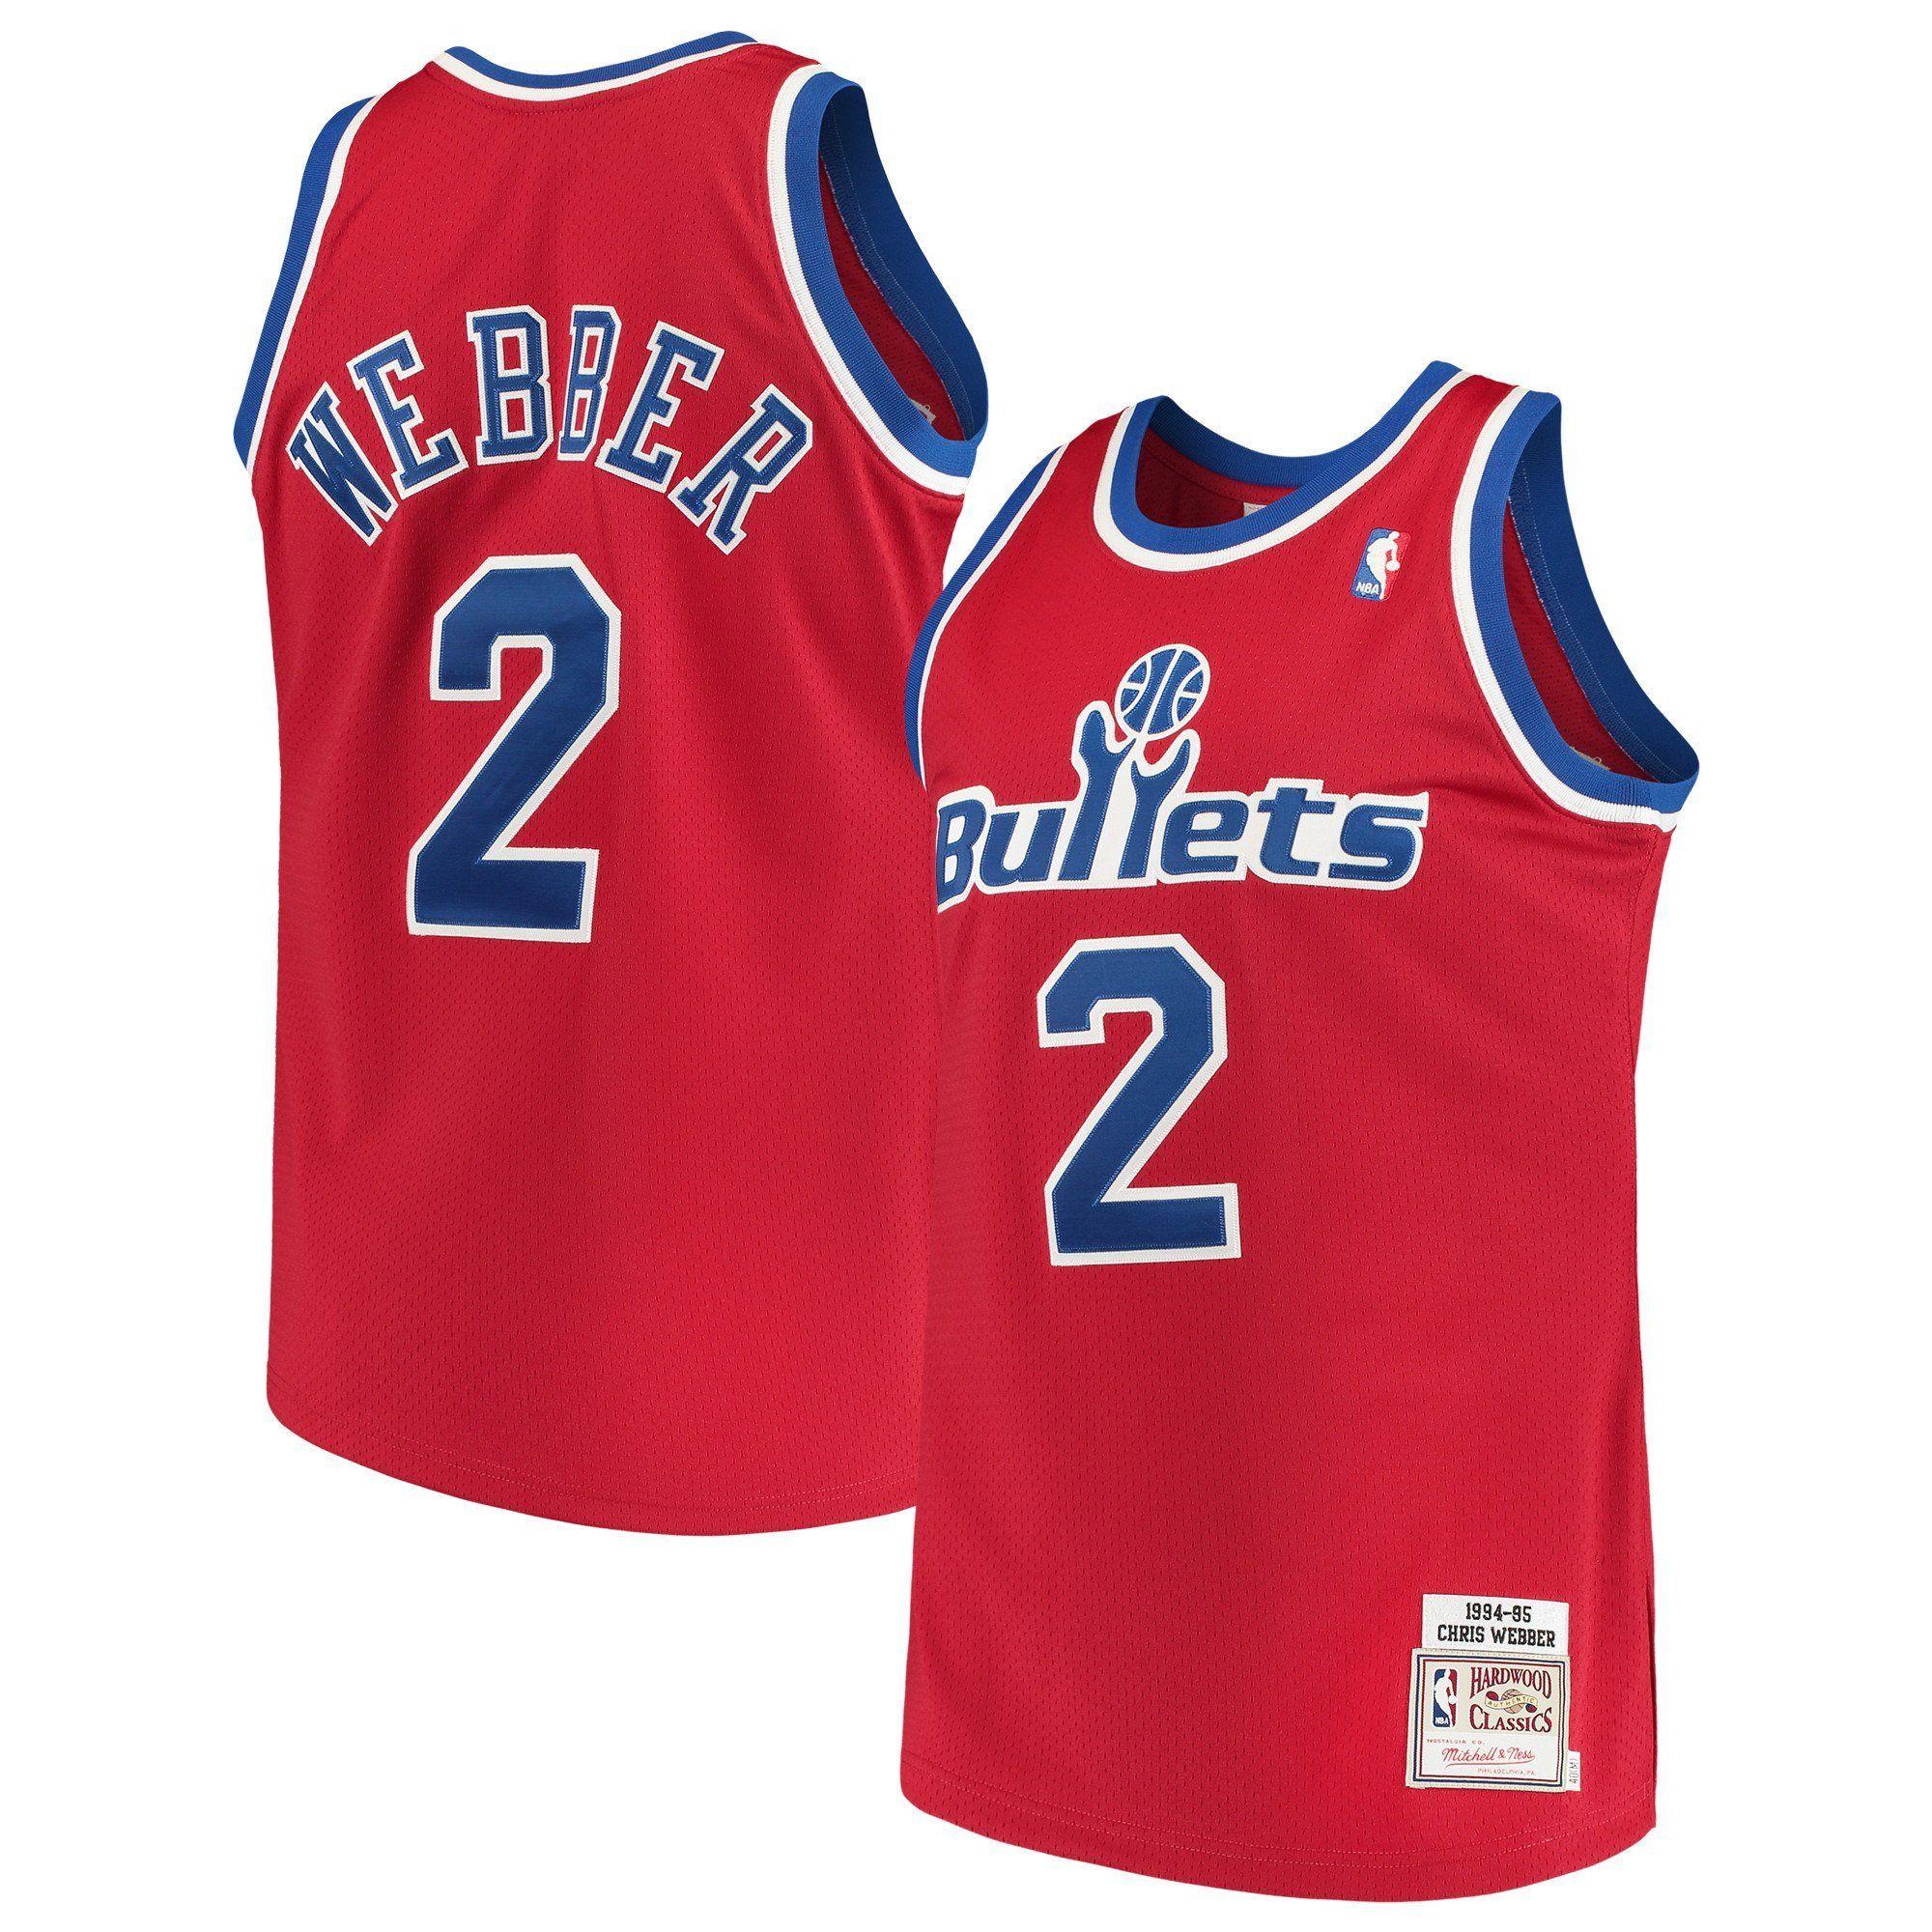 07fc4f58 Men's Washington Bullets Chris Webber Mitchell & Ness Red Road 1994/95 Hardwood  Classics Authentic Jersey